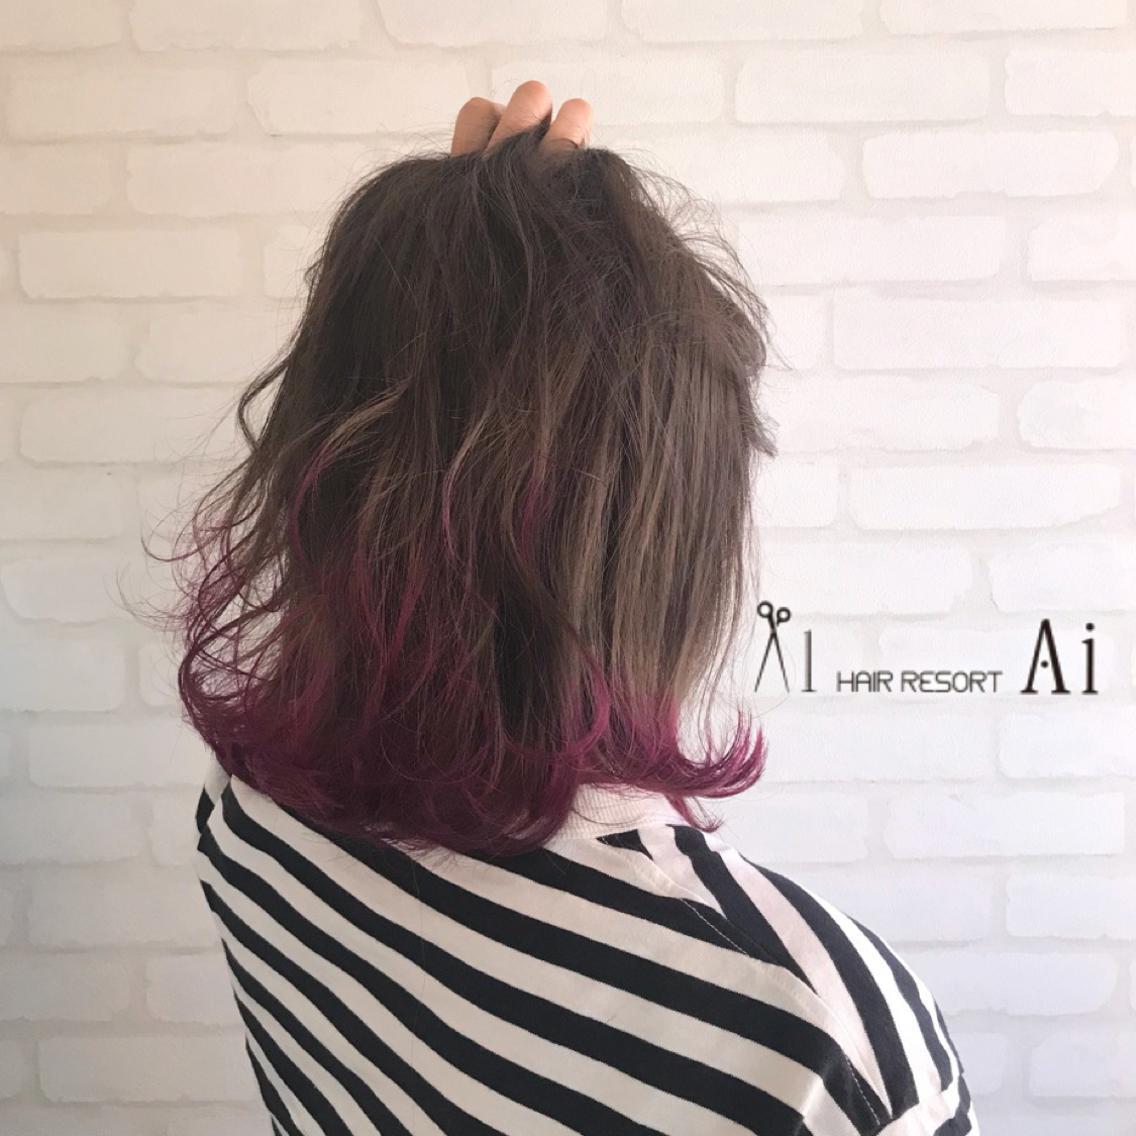 hair resort Ai所属・齊藤 友梨の掲載